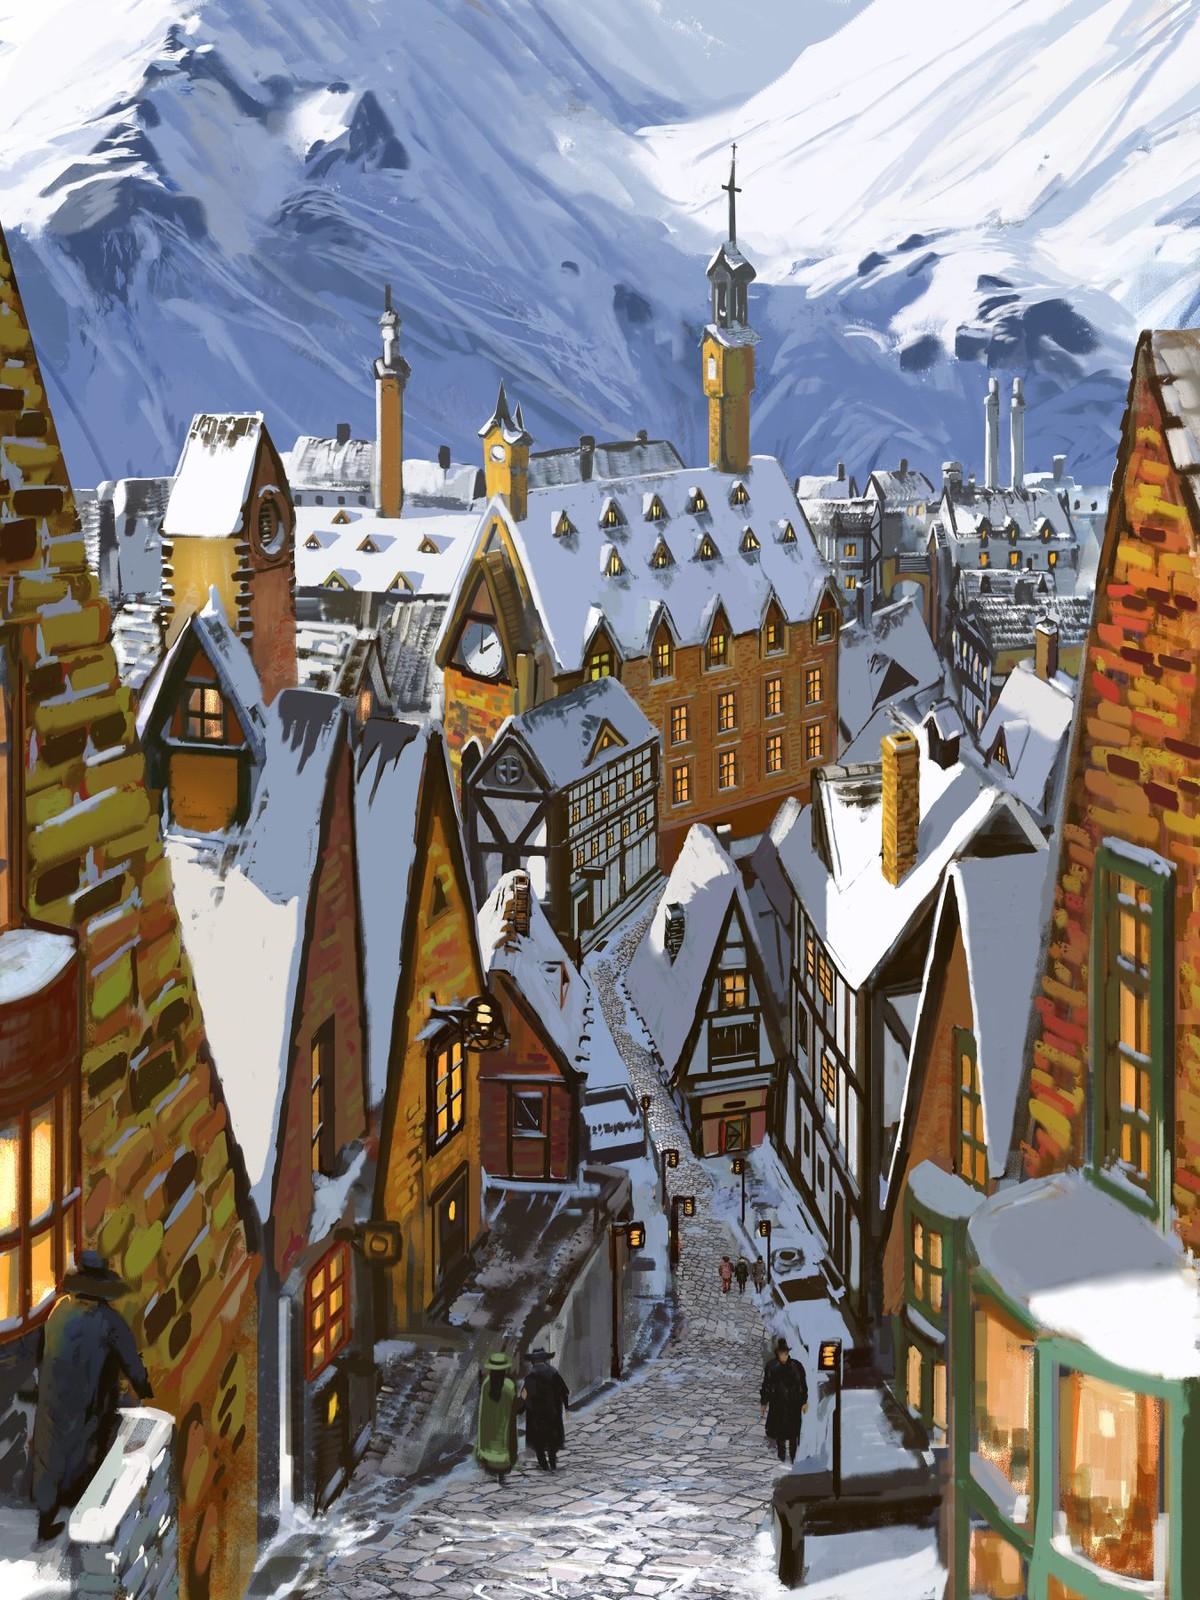 Old city under snow